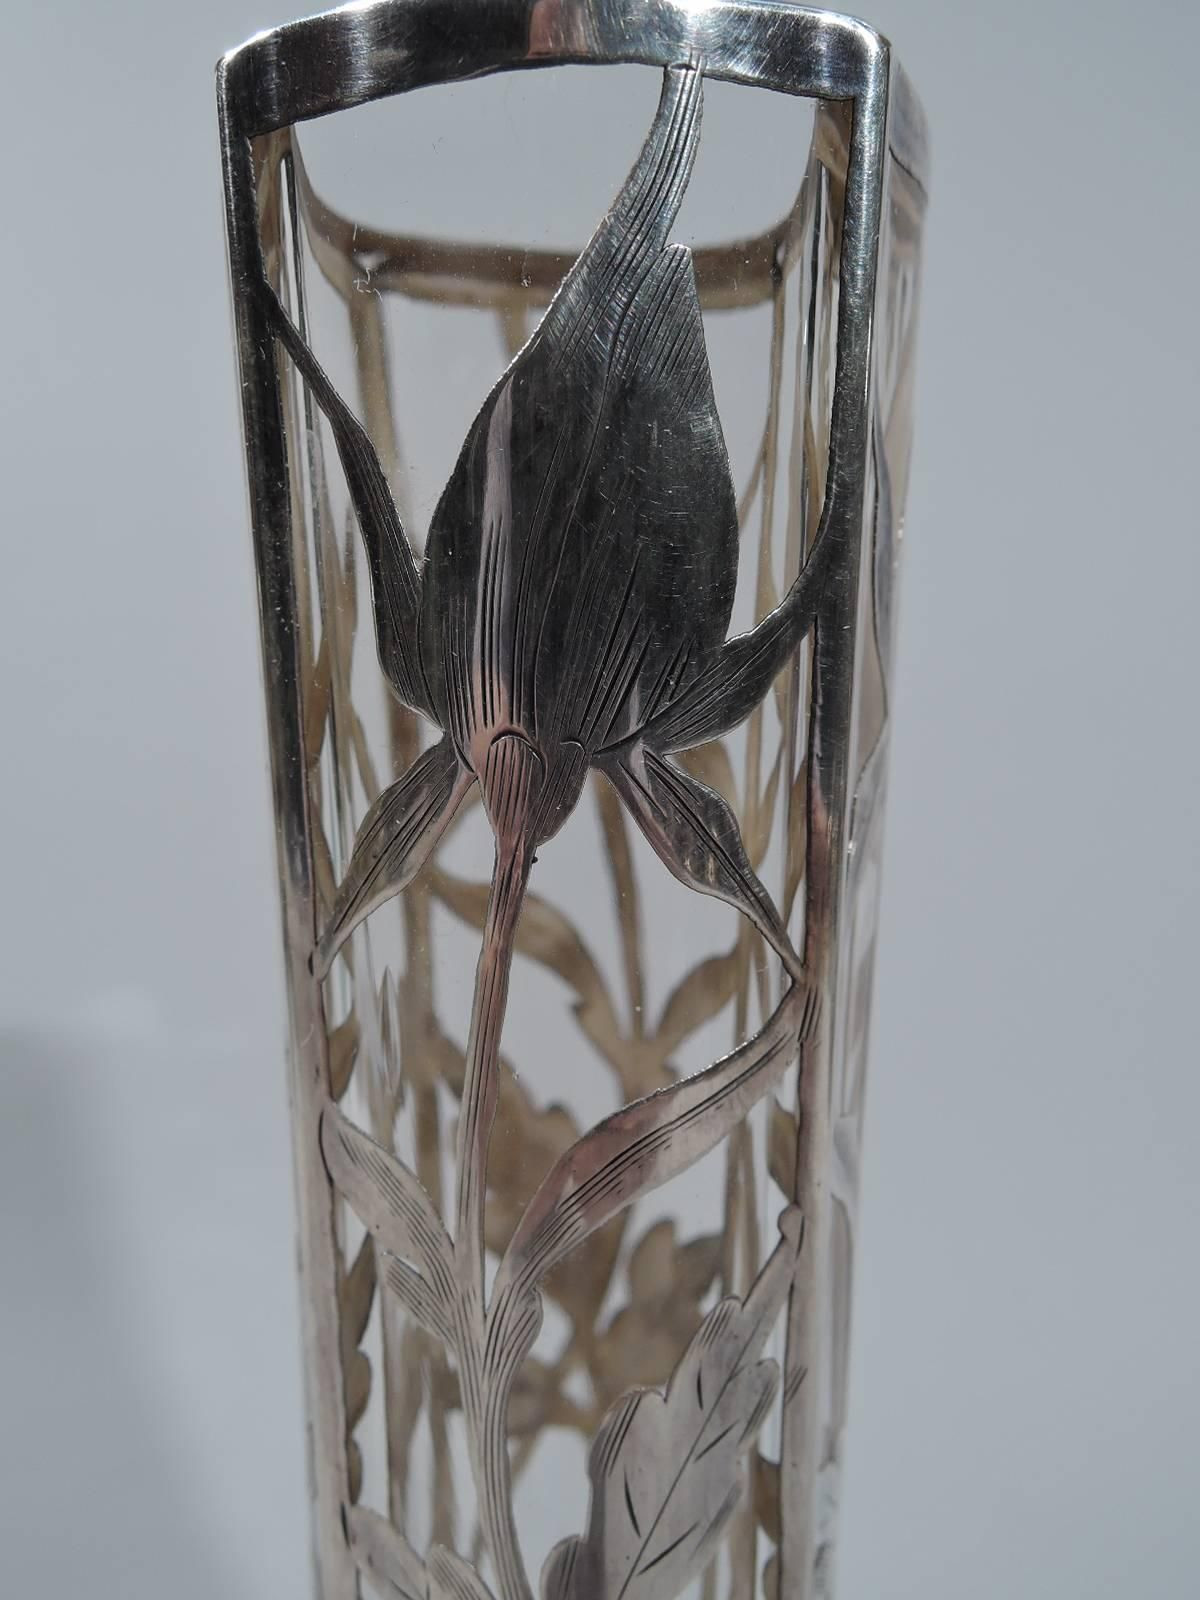 Art Deco Vases Antique Of 35 Antique Green Glass Vases the Weekly World for Antique Green Glass Vases Fresh Unusual American Art Nouveau Clear and Cranberry Glass Vase with Of Antique Green Glass Vases